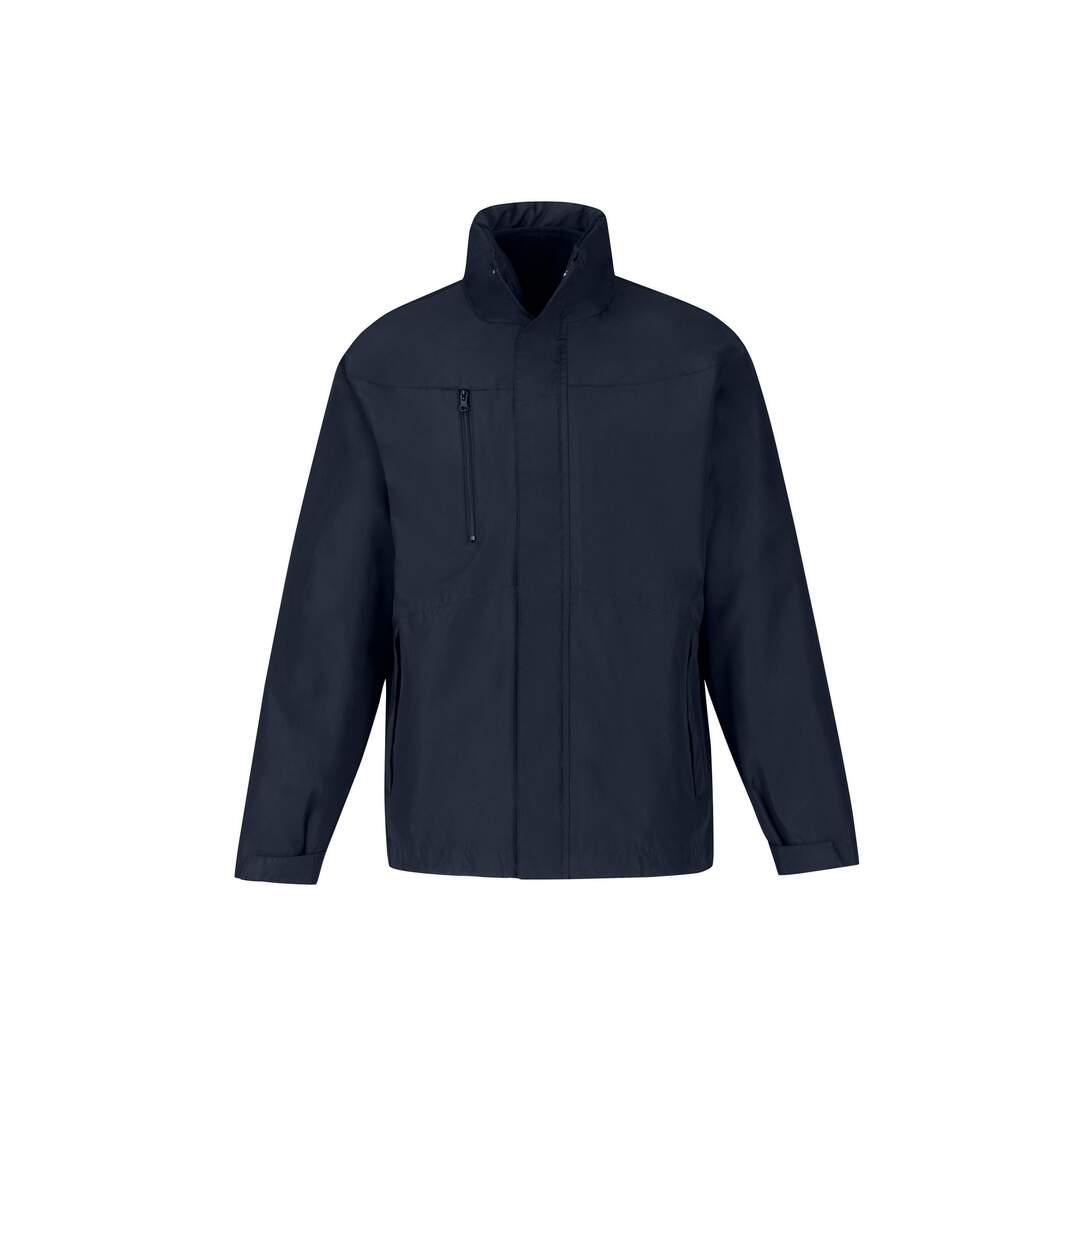 B&C - Veste parka 3 en 1 - Homme (Bleu marine) - UTRW4836